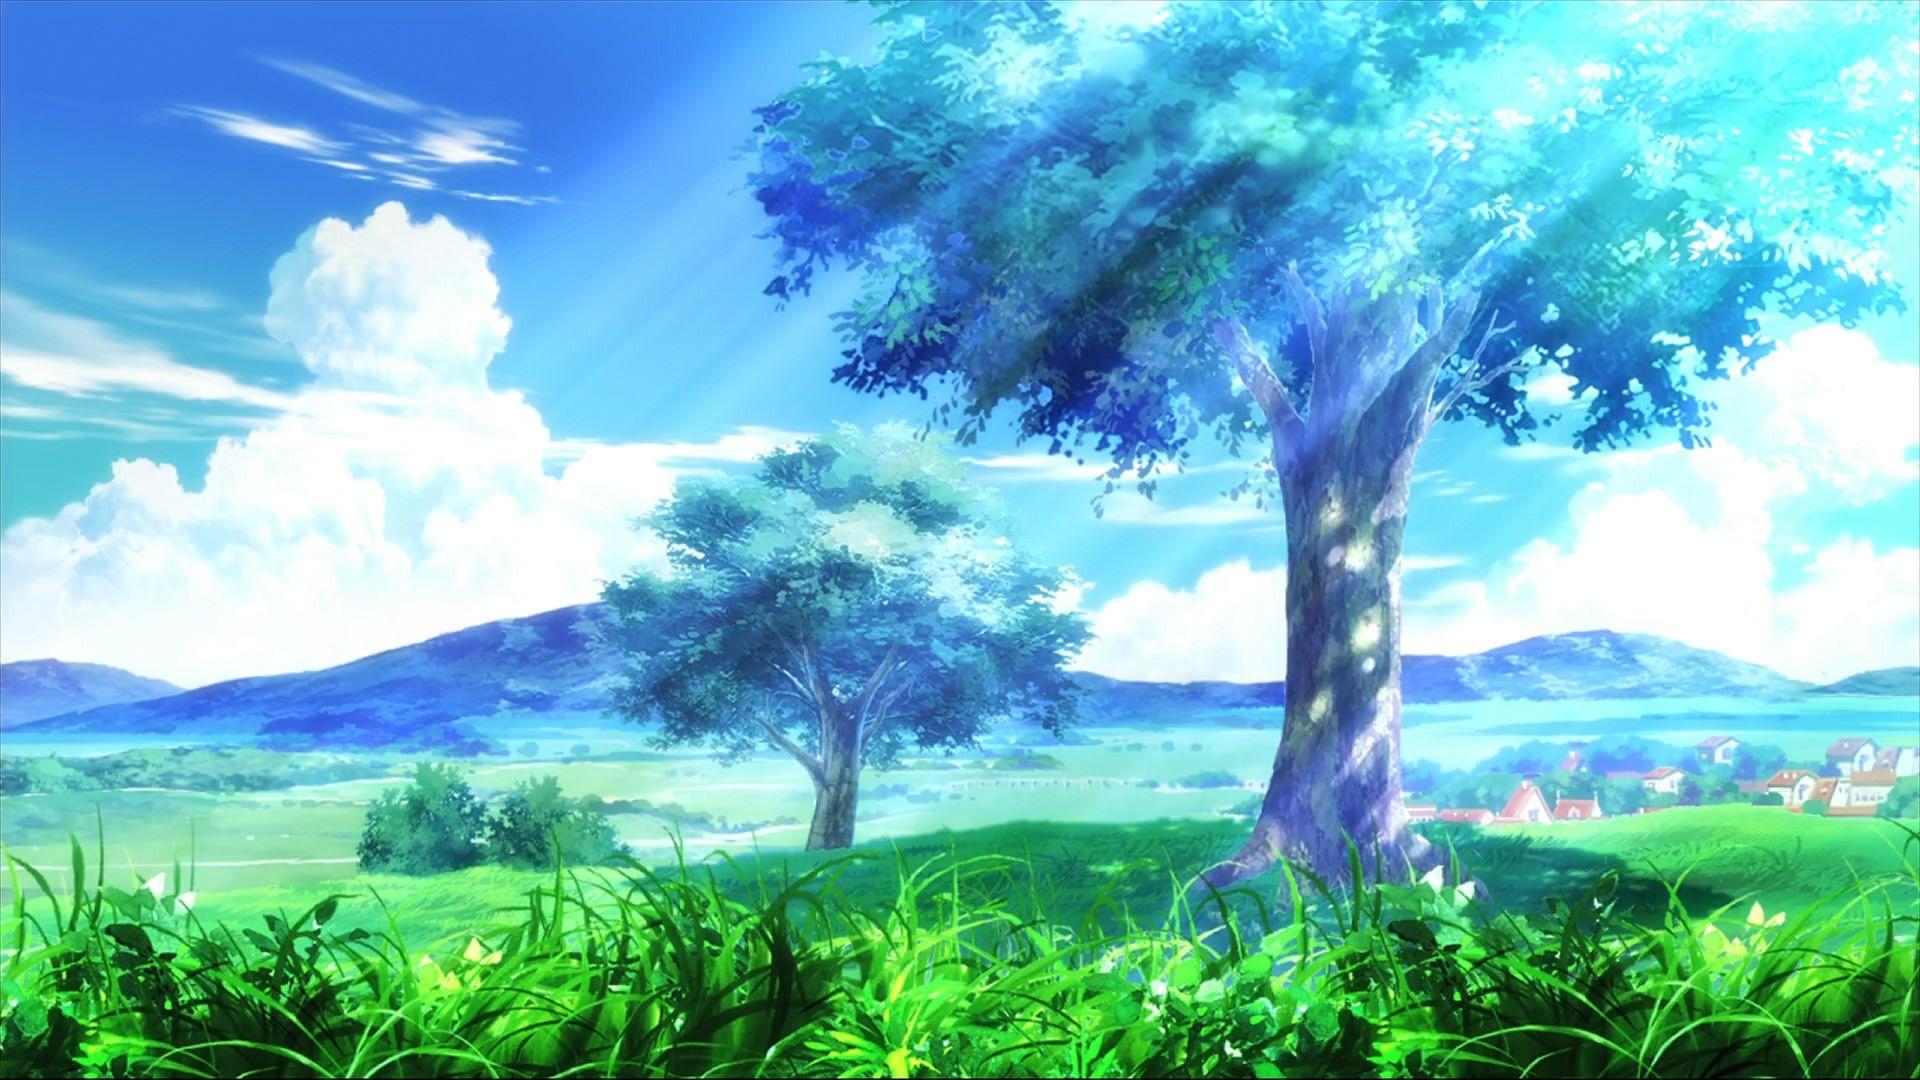 1920x1080 Anime Scenery Desktop Background Wallmeta Com Anime Scenery Wallpaper Scenery Wallpaper Anime Backgrounds Wallpapers